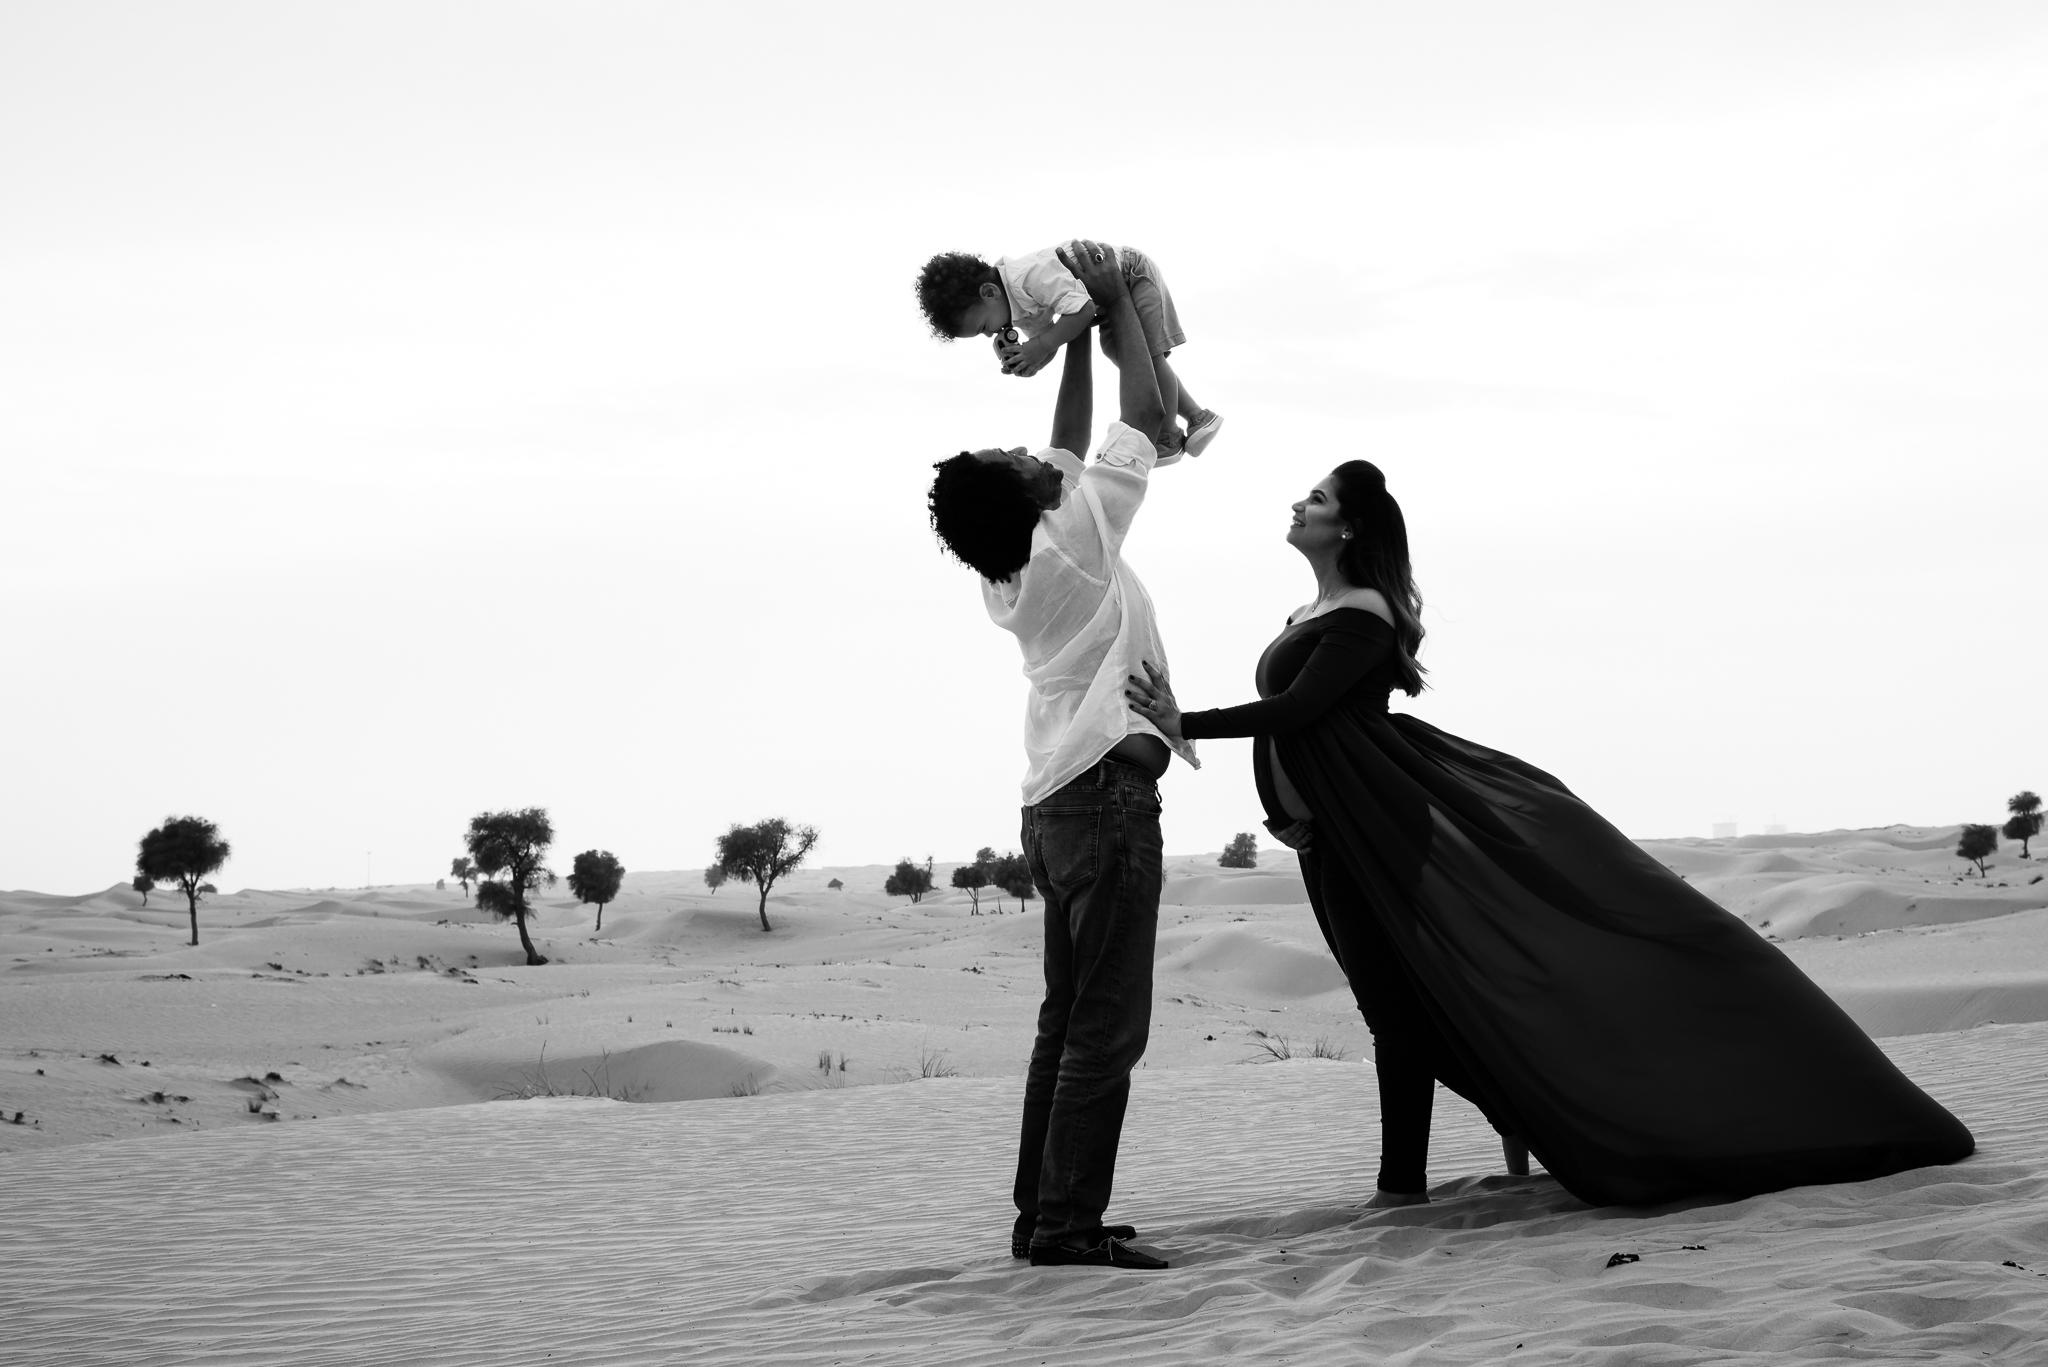 Lana-Photographs-Dubai-Maternity-Photographer-FatimaE-PSLR-07.jpg